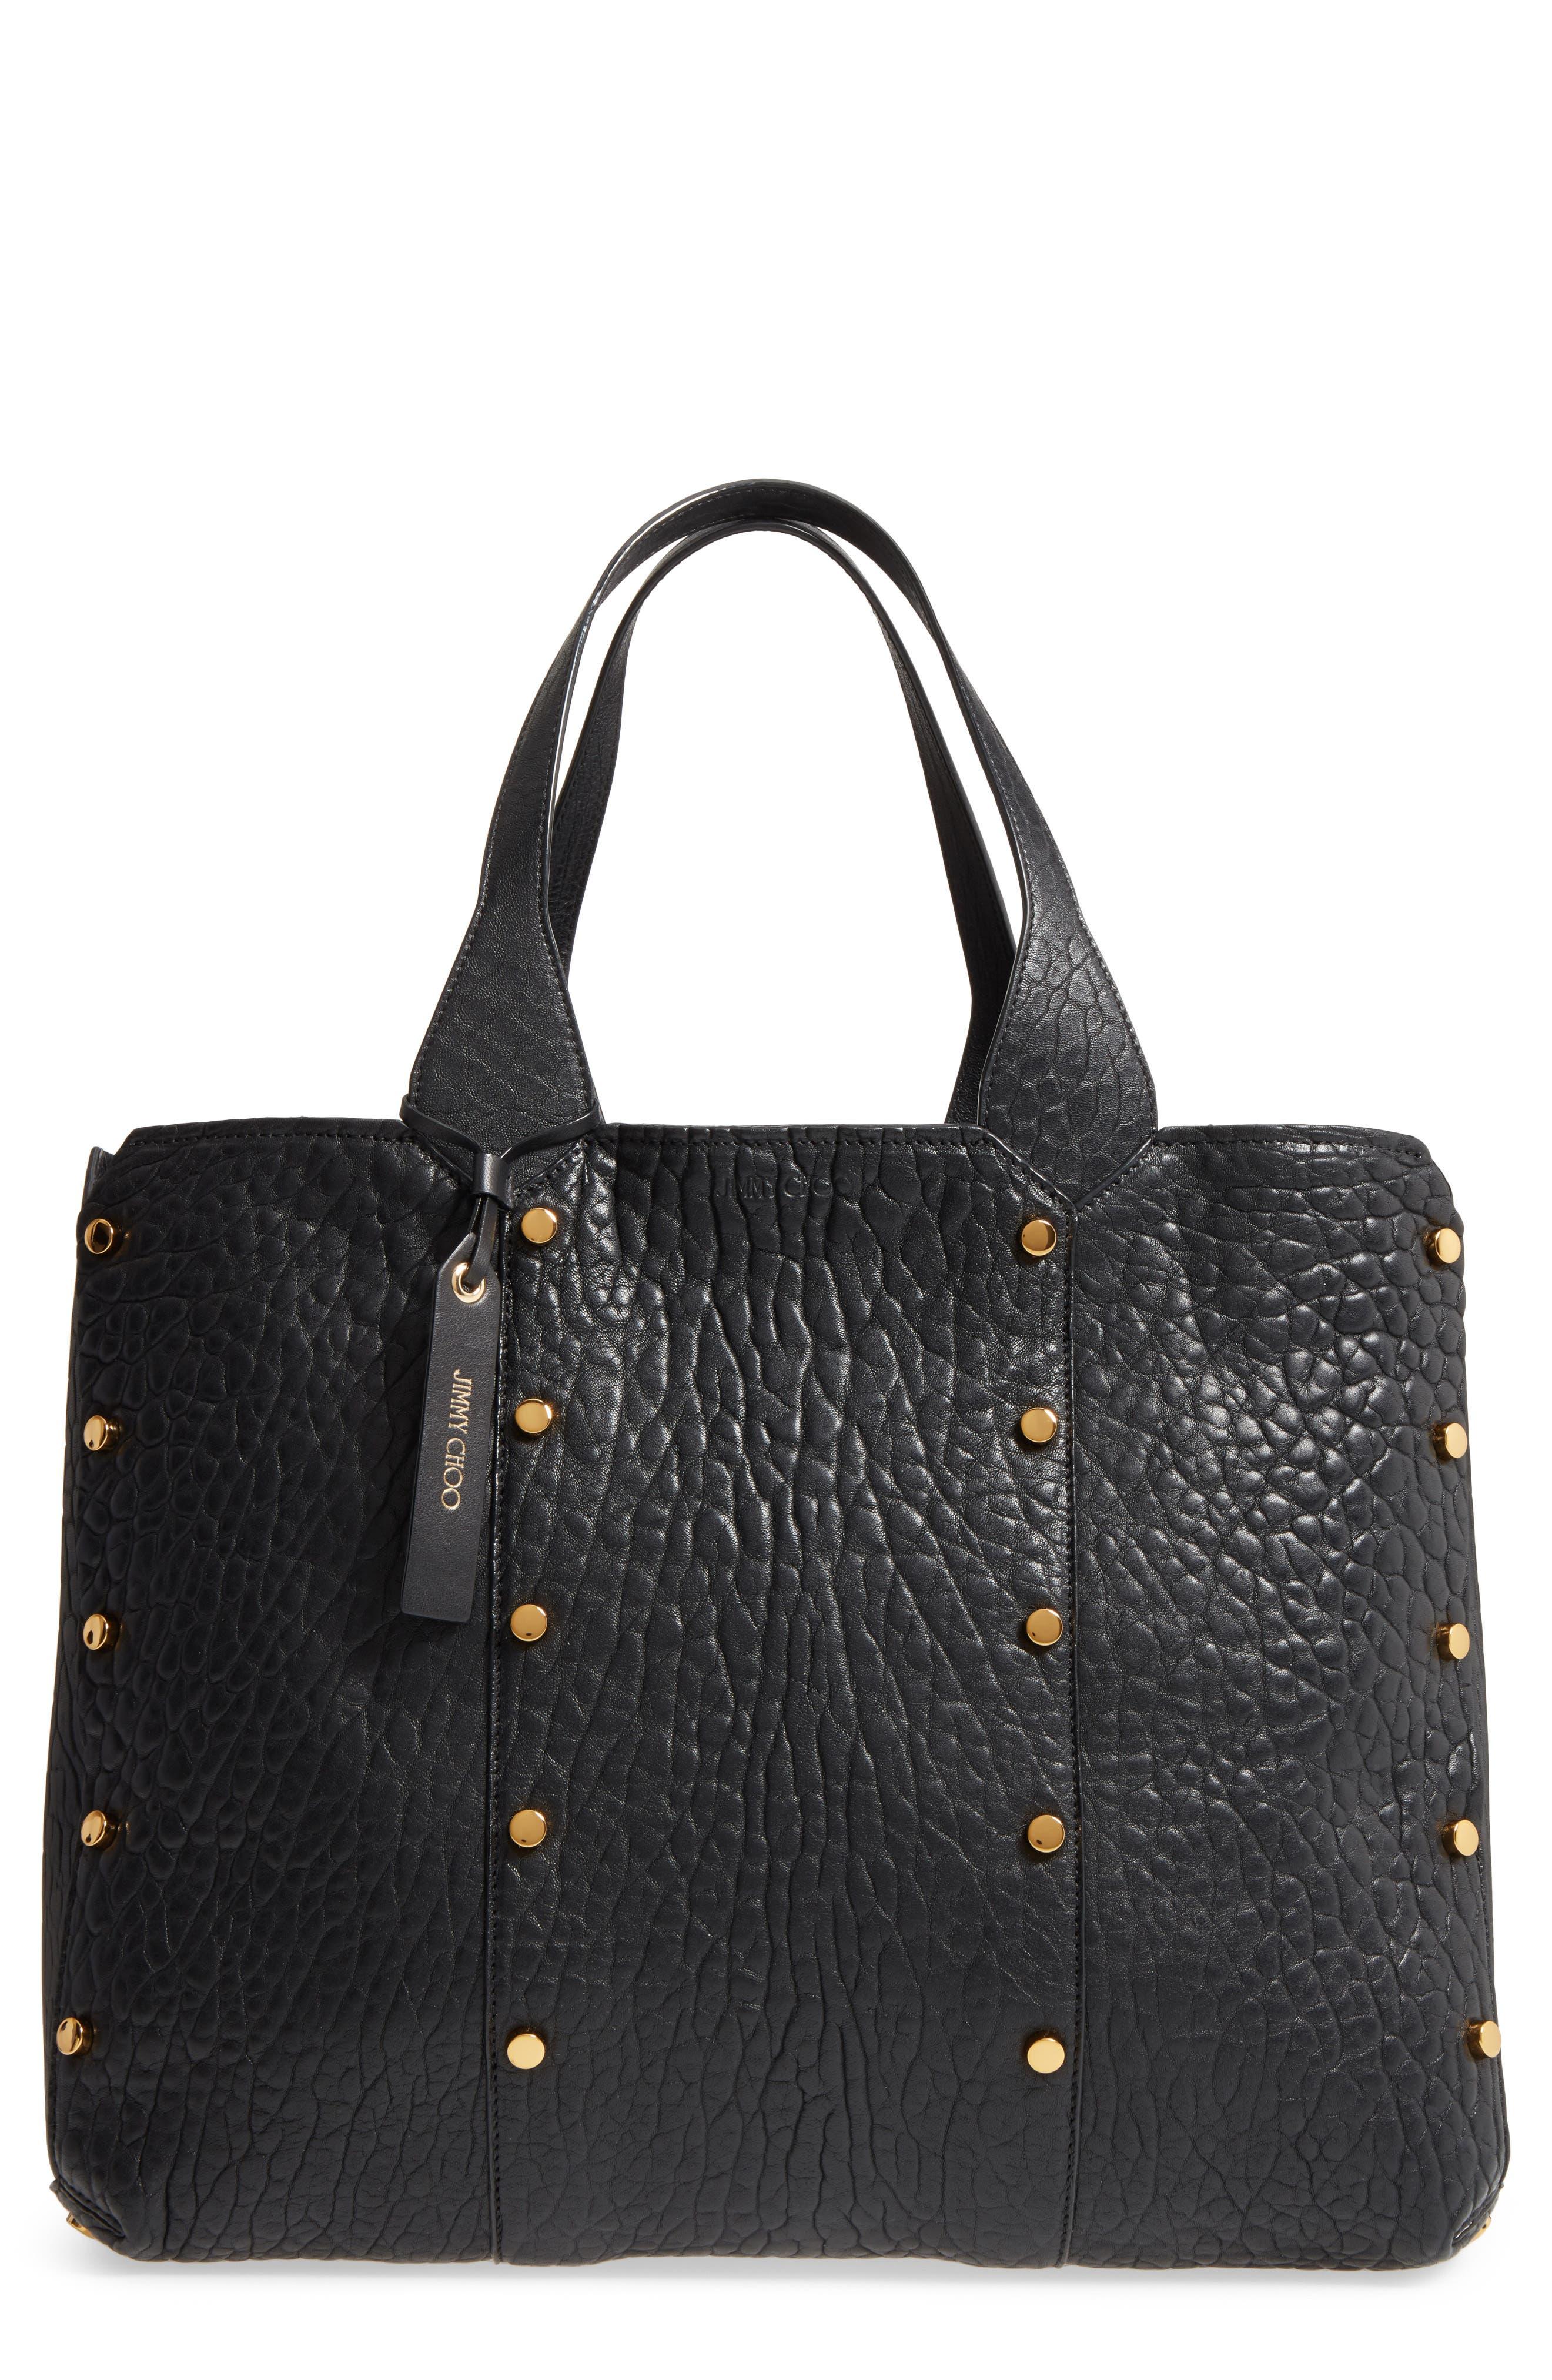 Lockett Leather Shopper,                             Main thumbnail 1, color,                             002